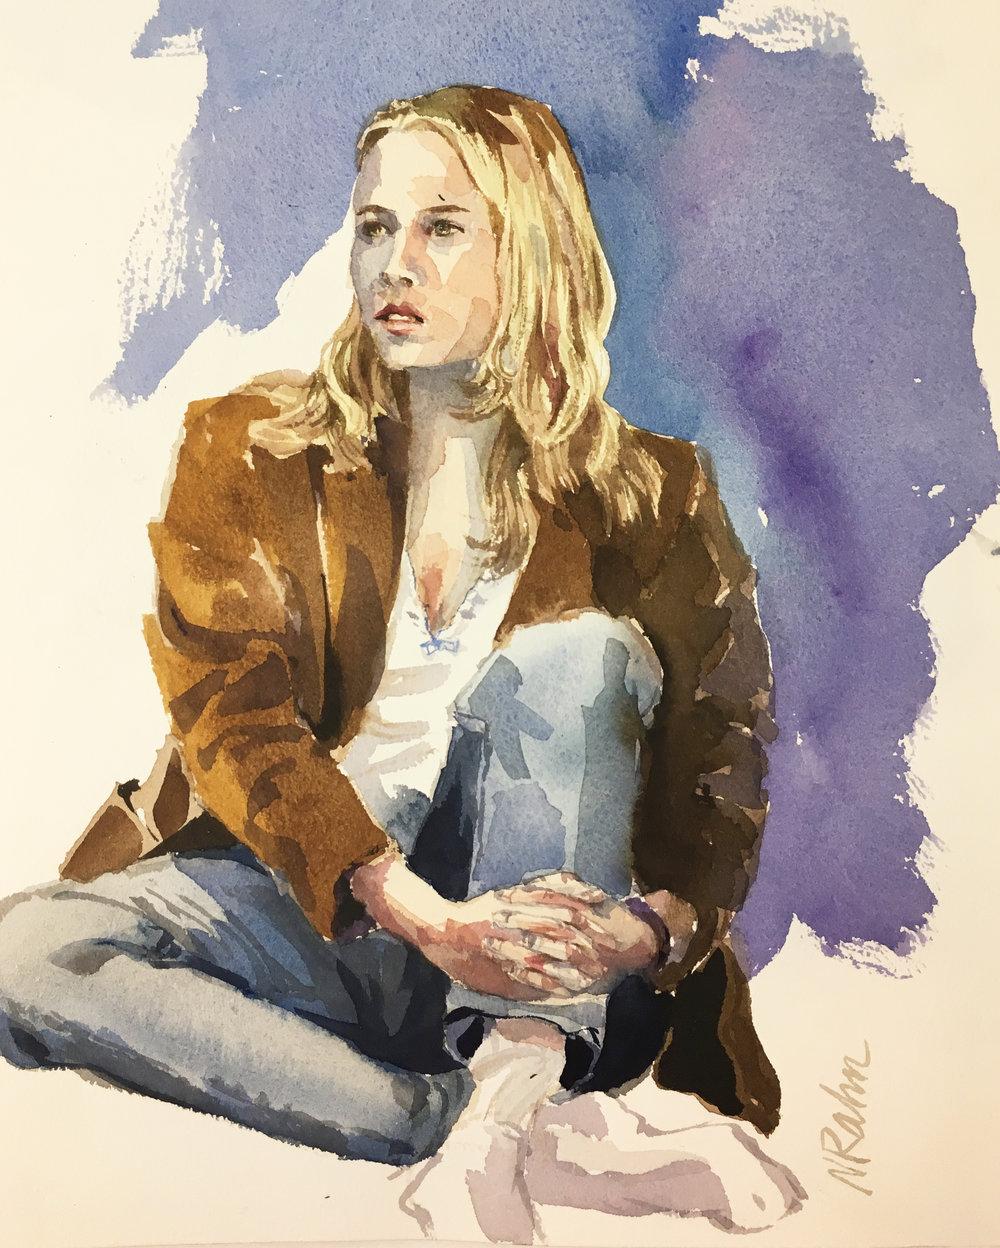 Watercolor - SKETCHES By Norma Erler Rahn